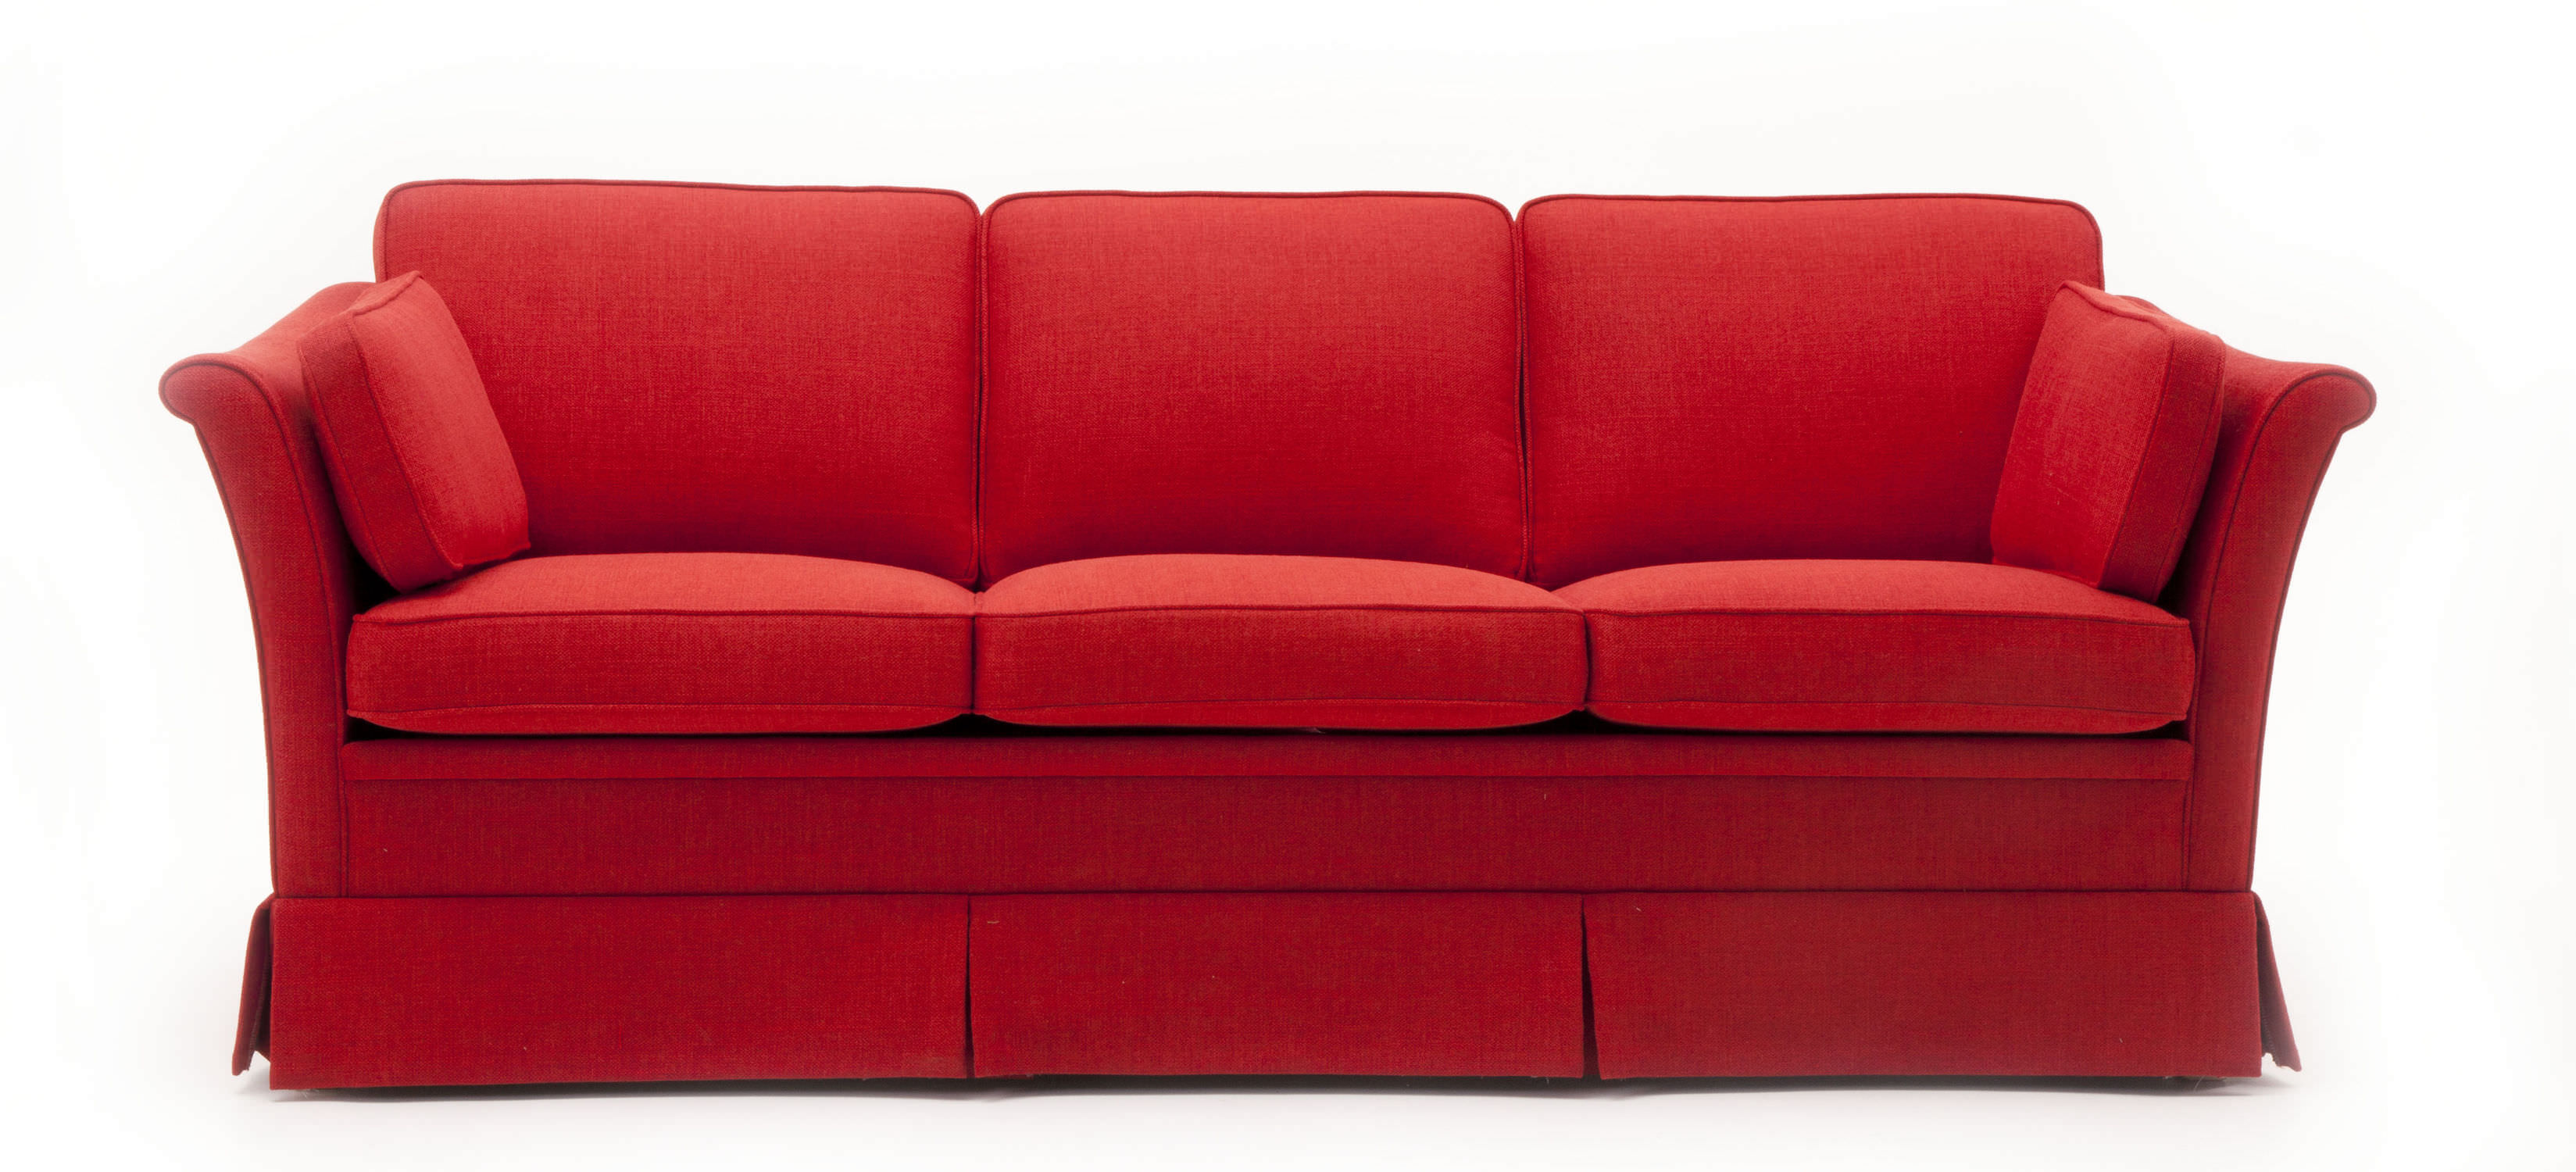 Sofa Klassisch klassisches sofa stoff 3 plätze mit abnehmbaren bezug